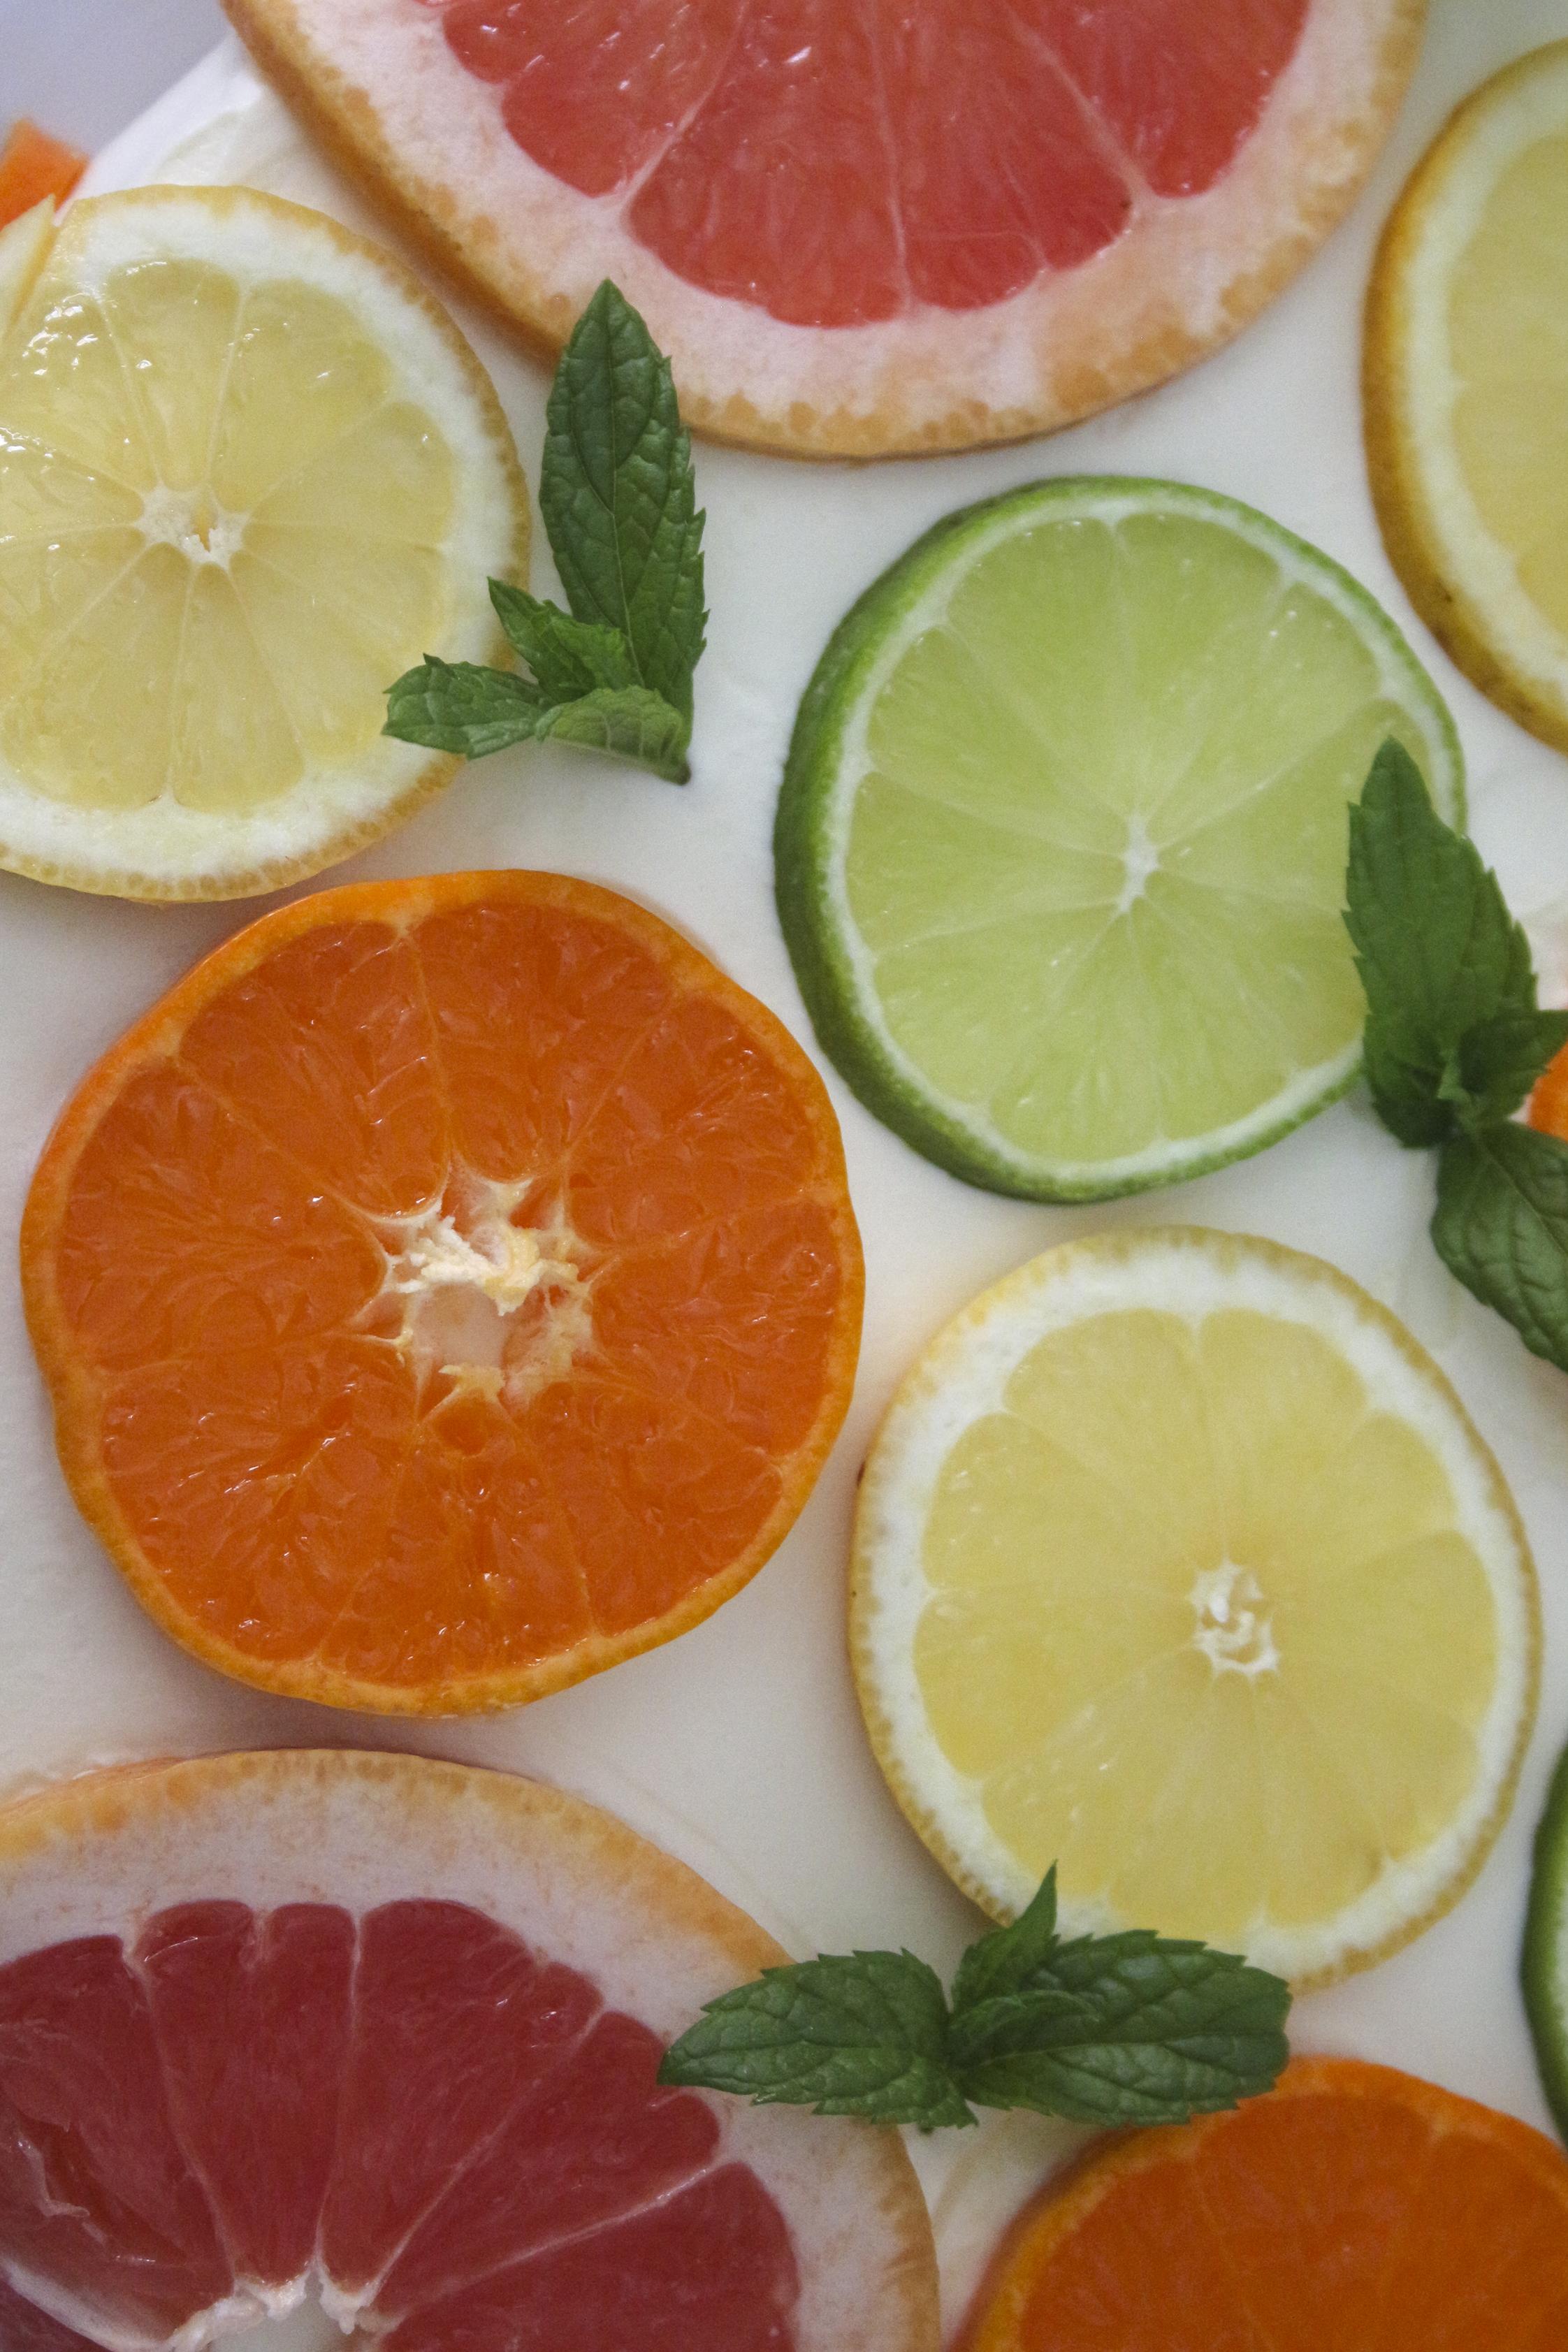 Coconut Cake with Citrus8